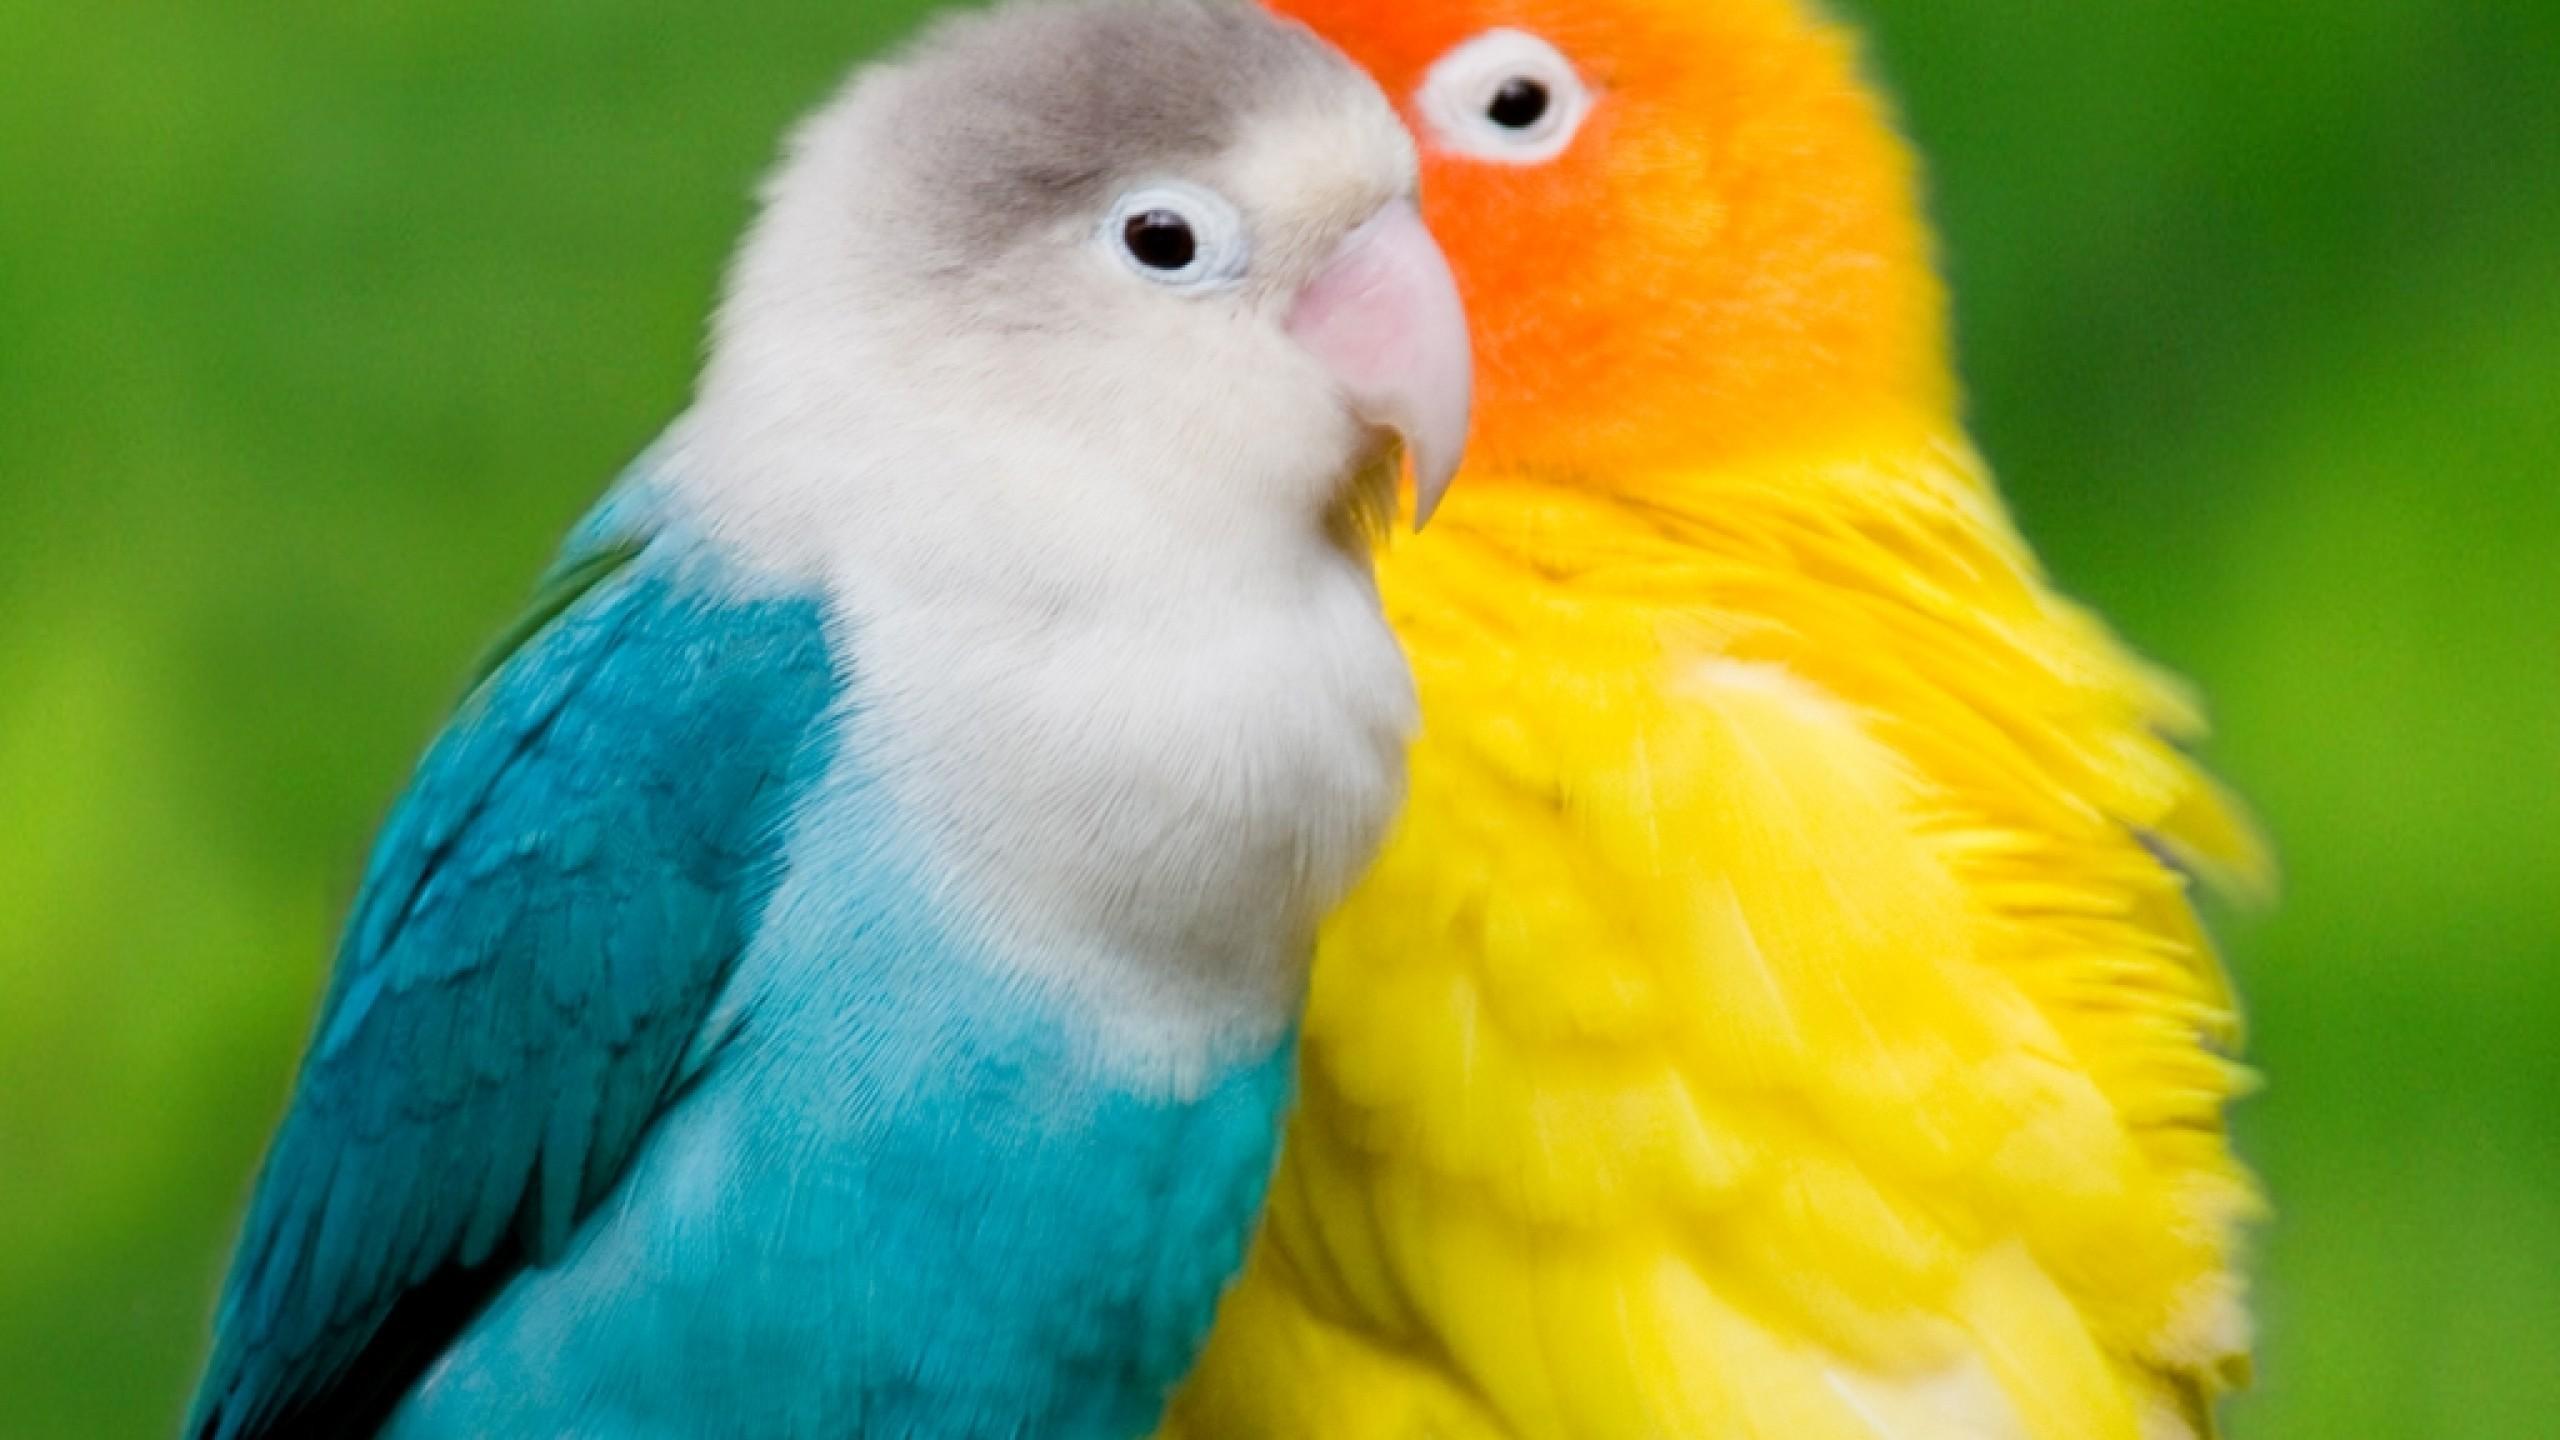 love birds wallpapers wallpapertag